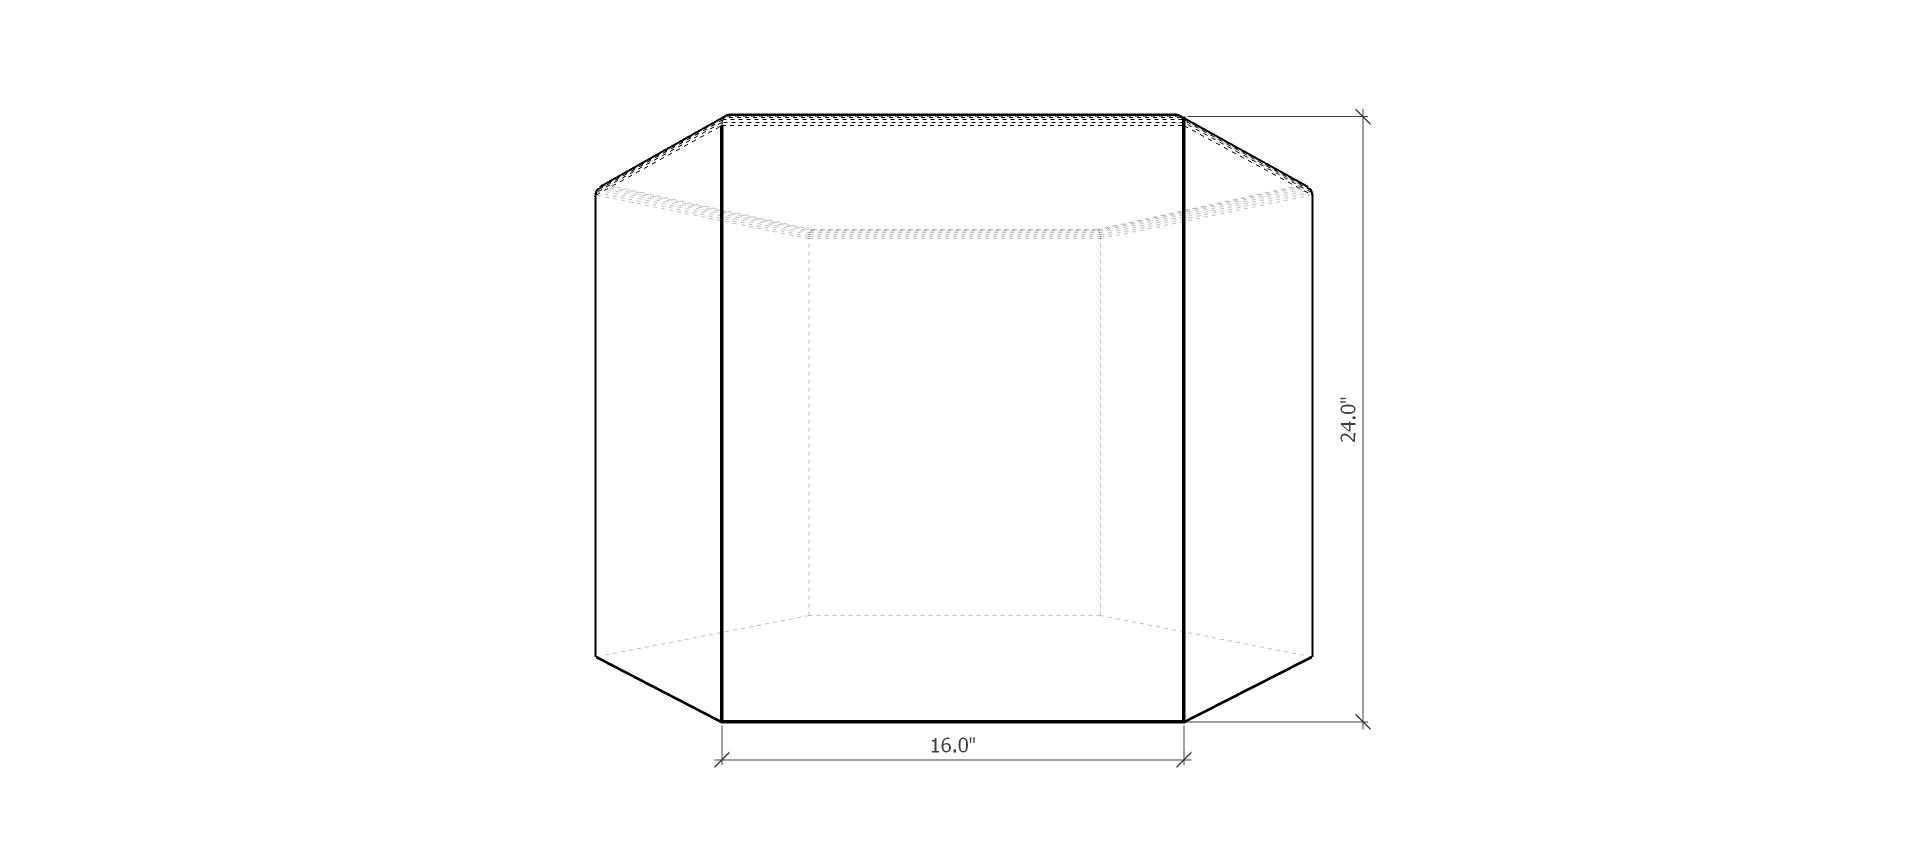 7 - saturnian - tall hex front.jpg